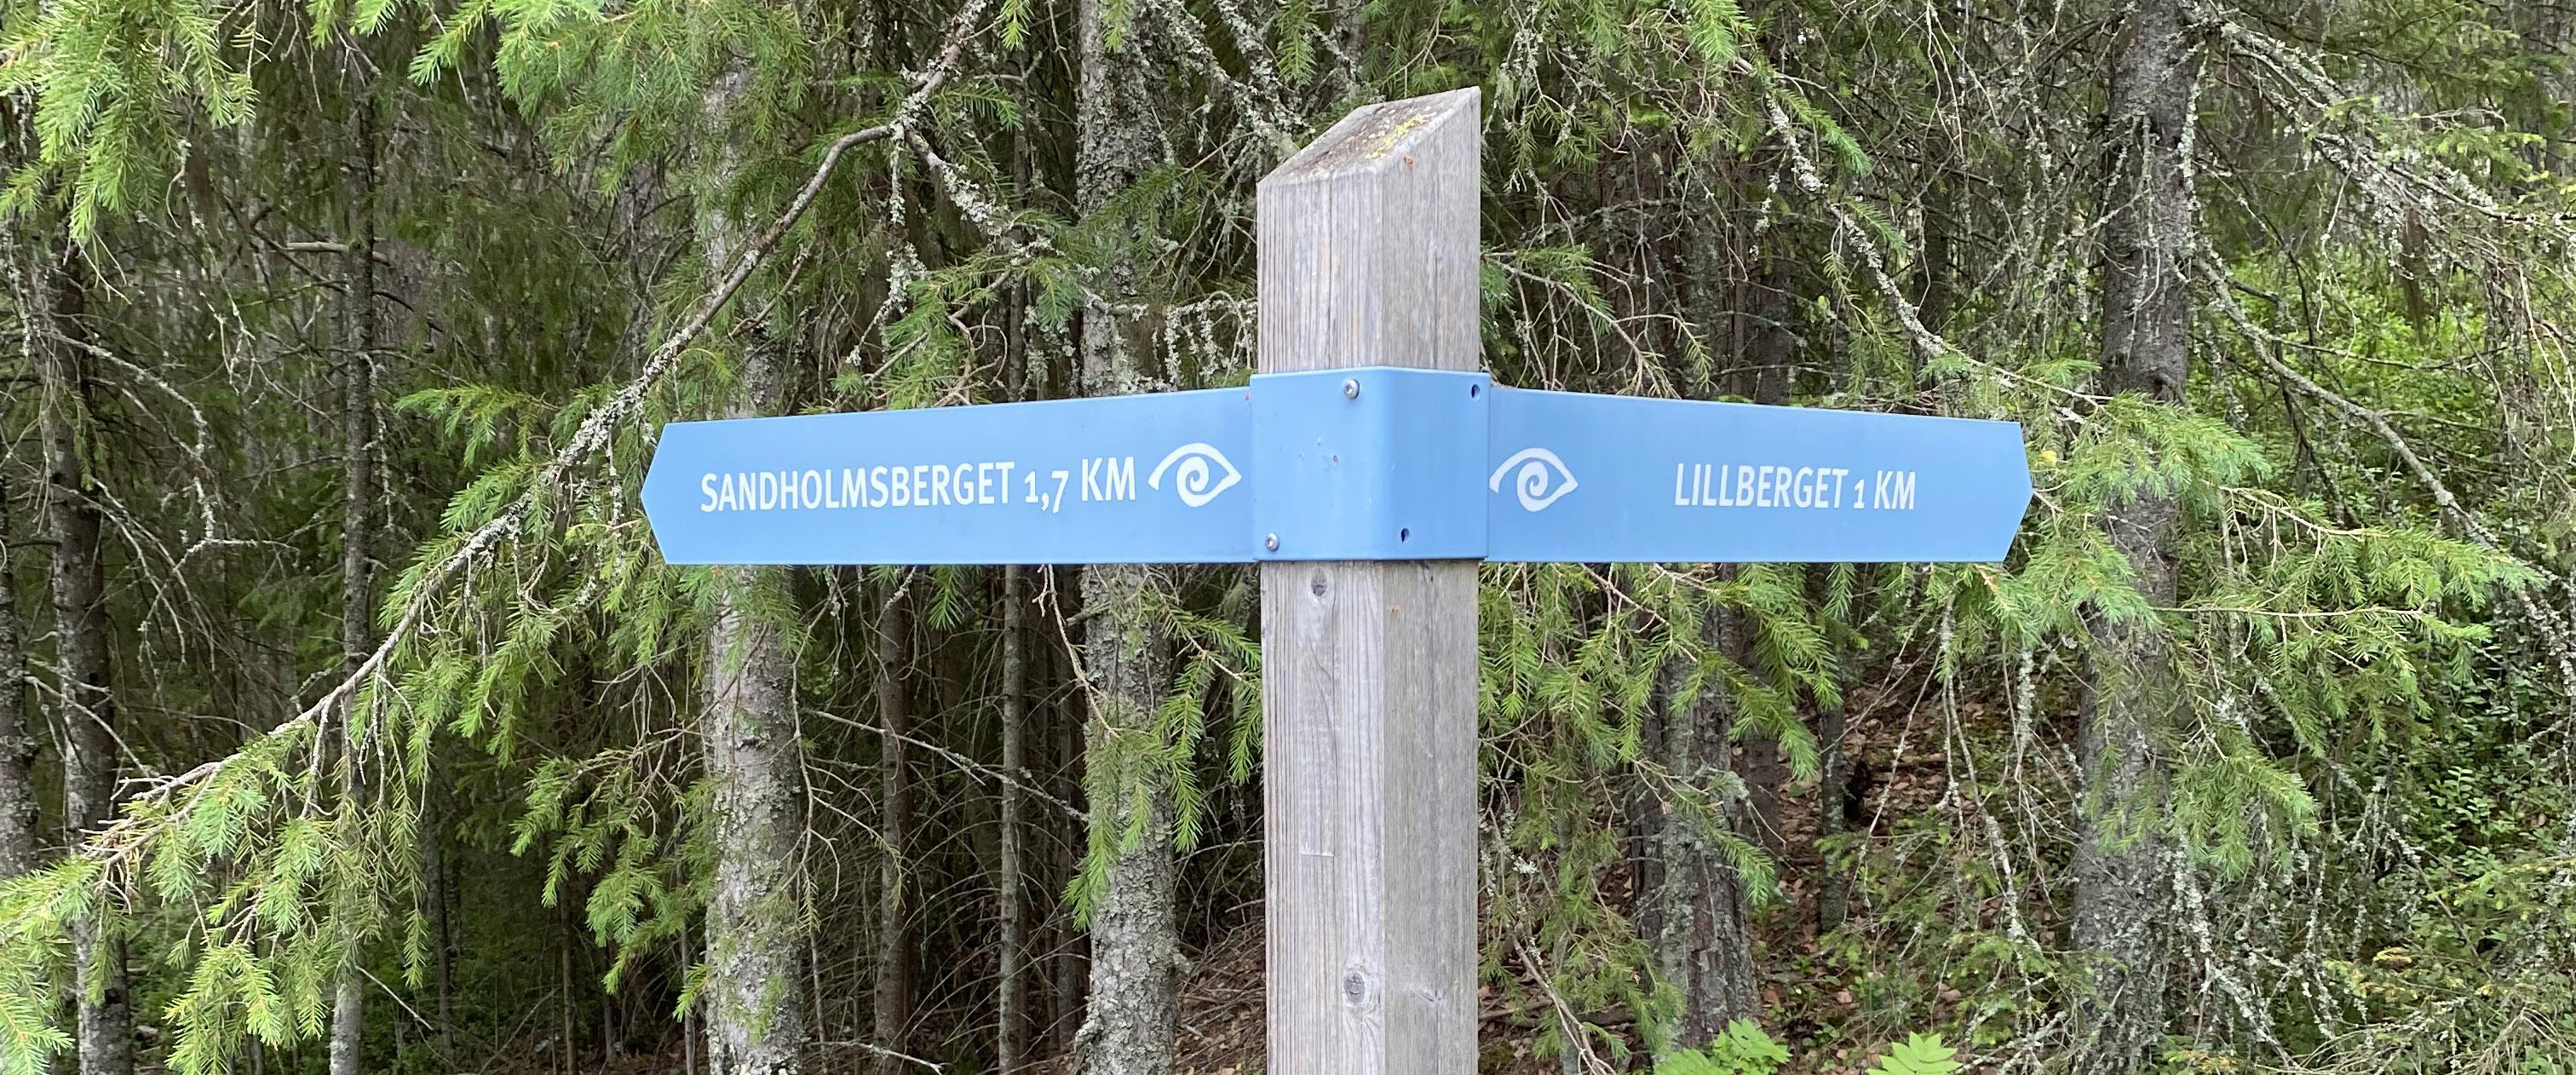 Stigen tar dig mellan Sandholmsberget, Lillberget och Högberget.